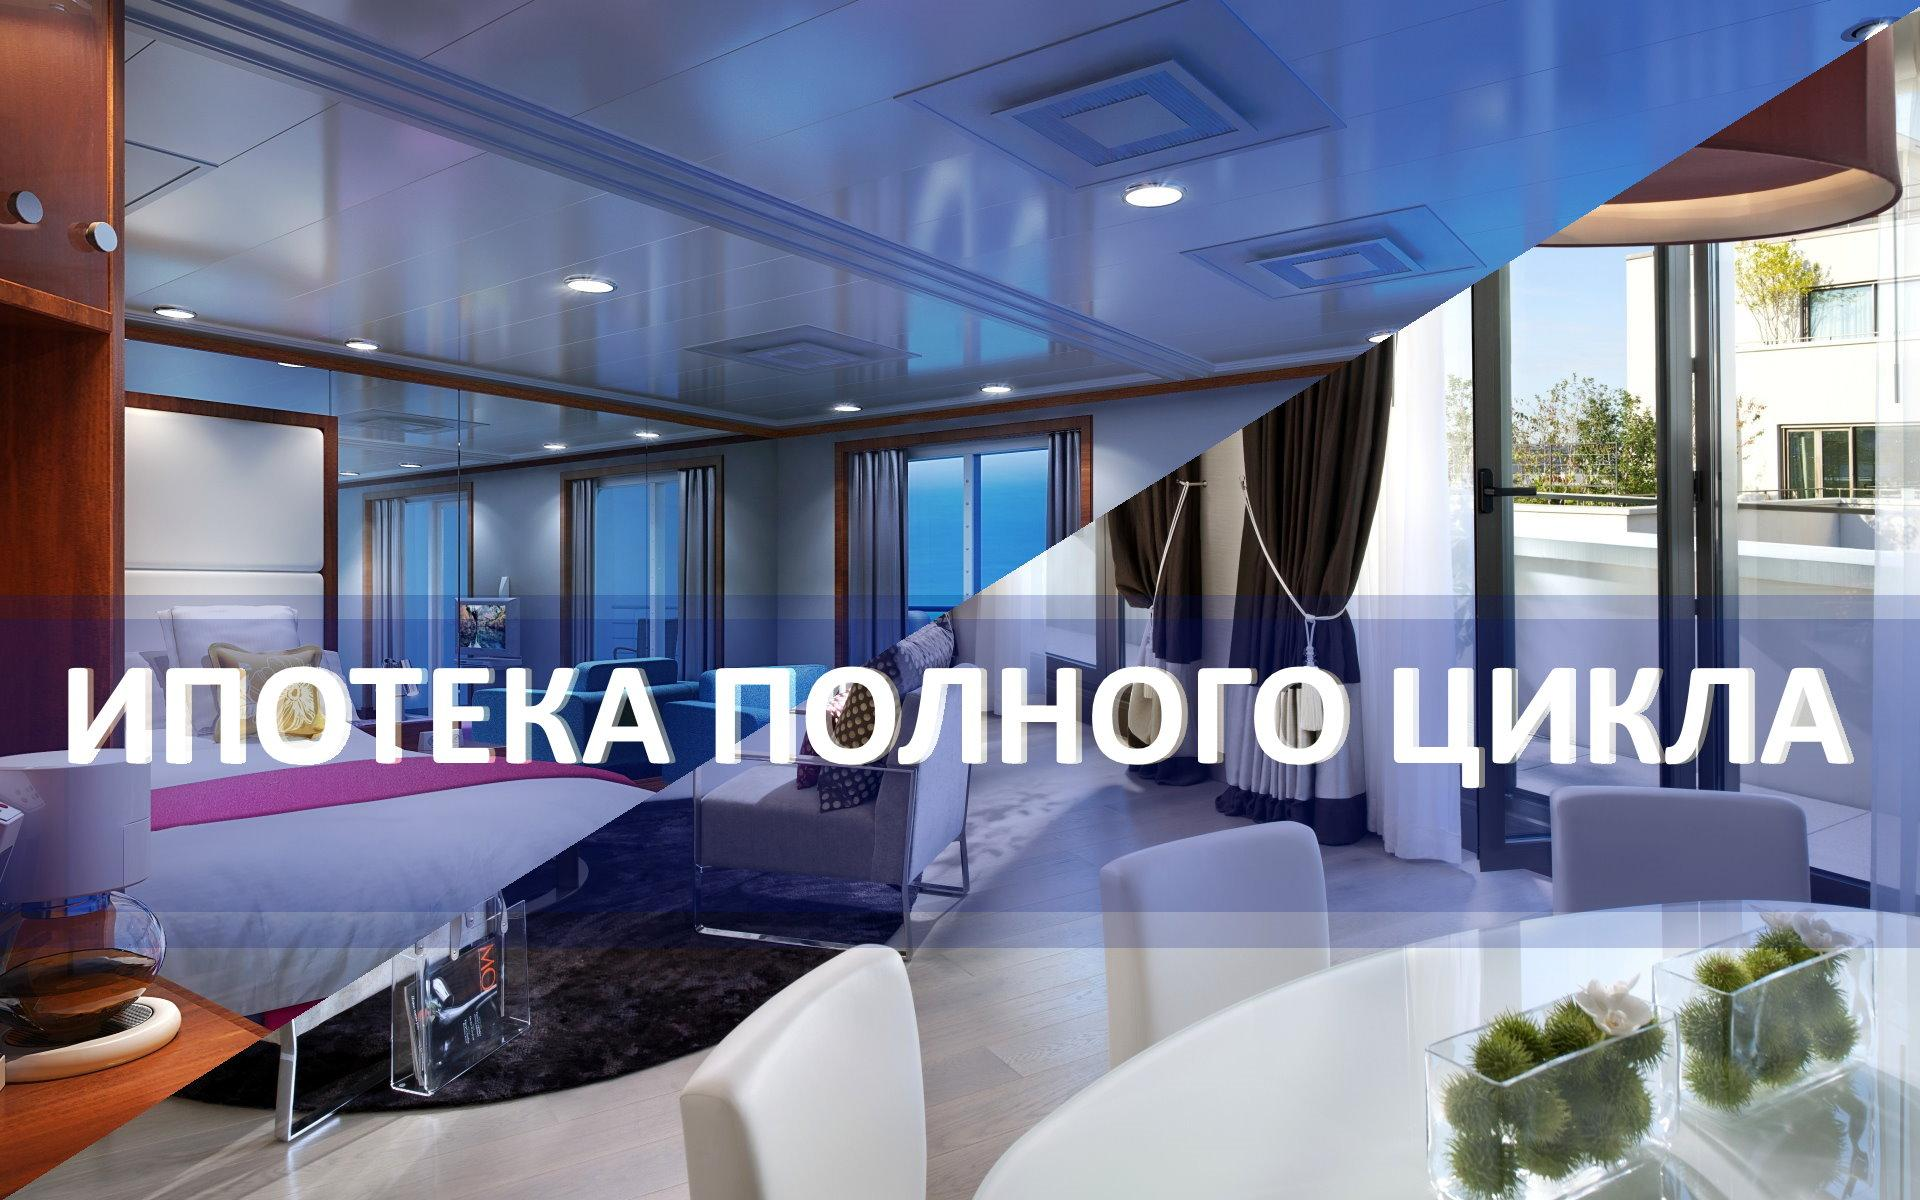 Ипотека банка «Промсвязьбанк»